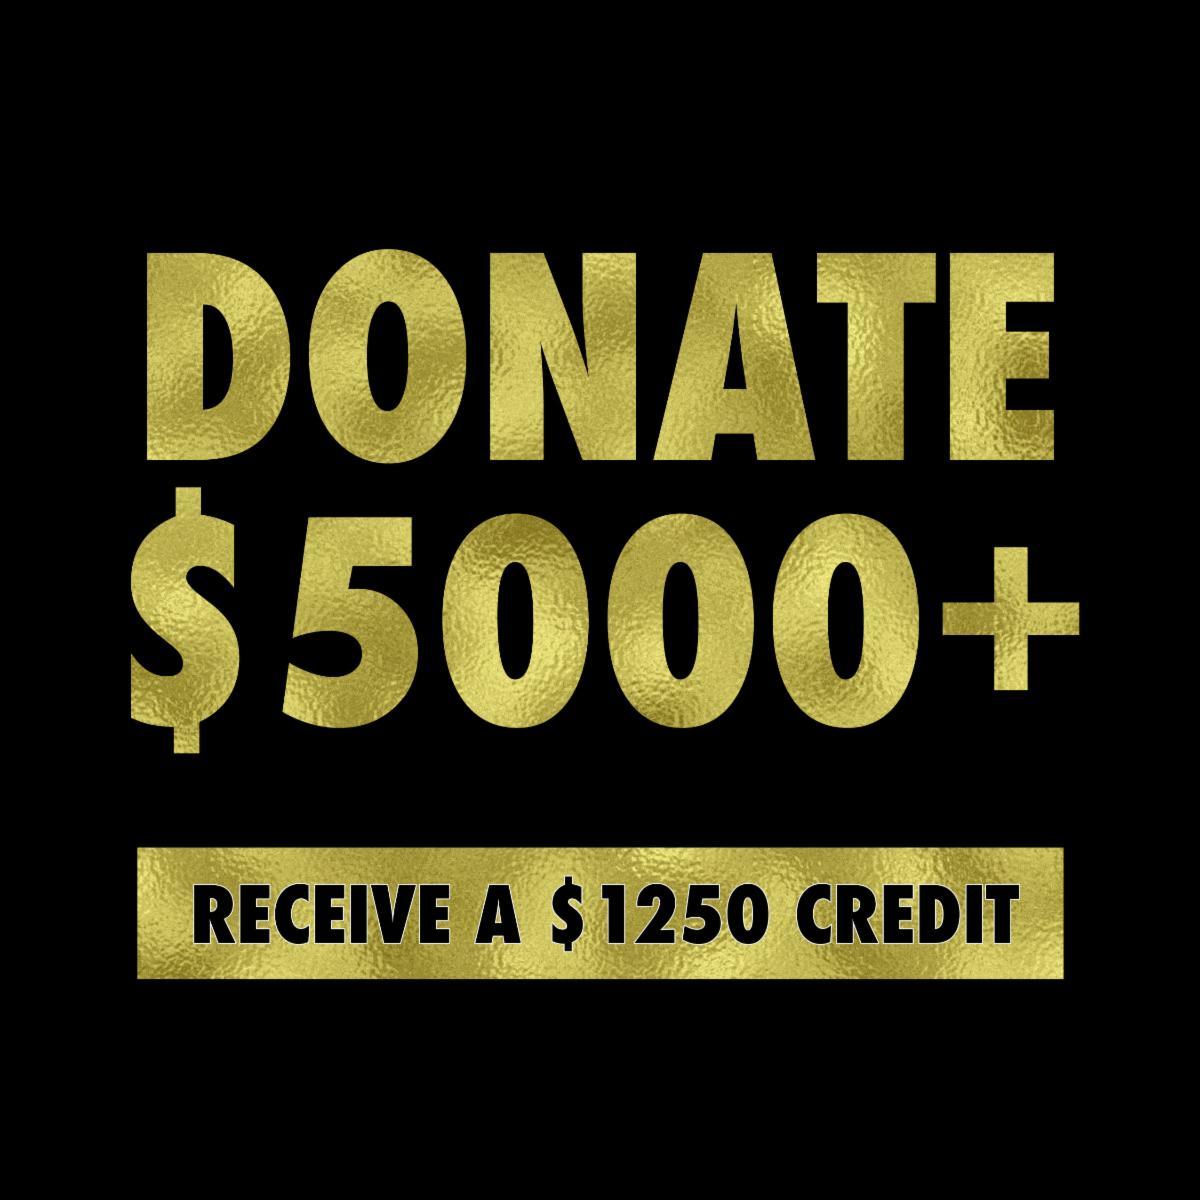 Donate $5000 Receive $1250